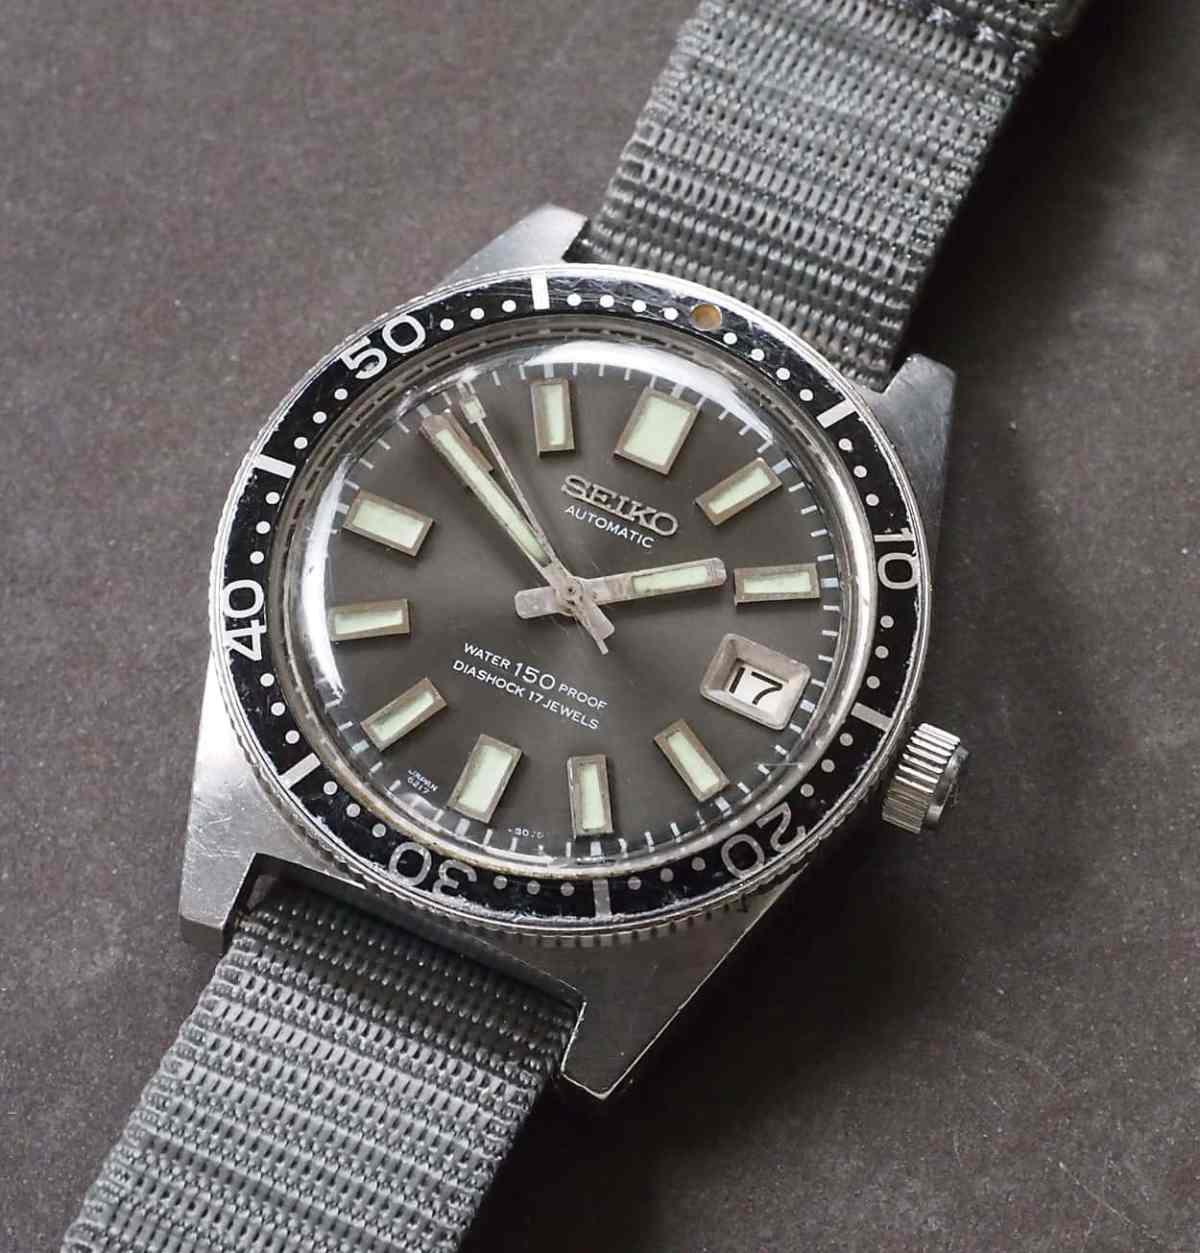 1965 Seiko 62MAS Diver, one of Mr. Hattori's favorite historic Seiko watches